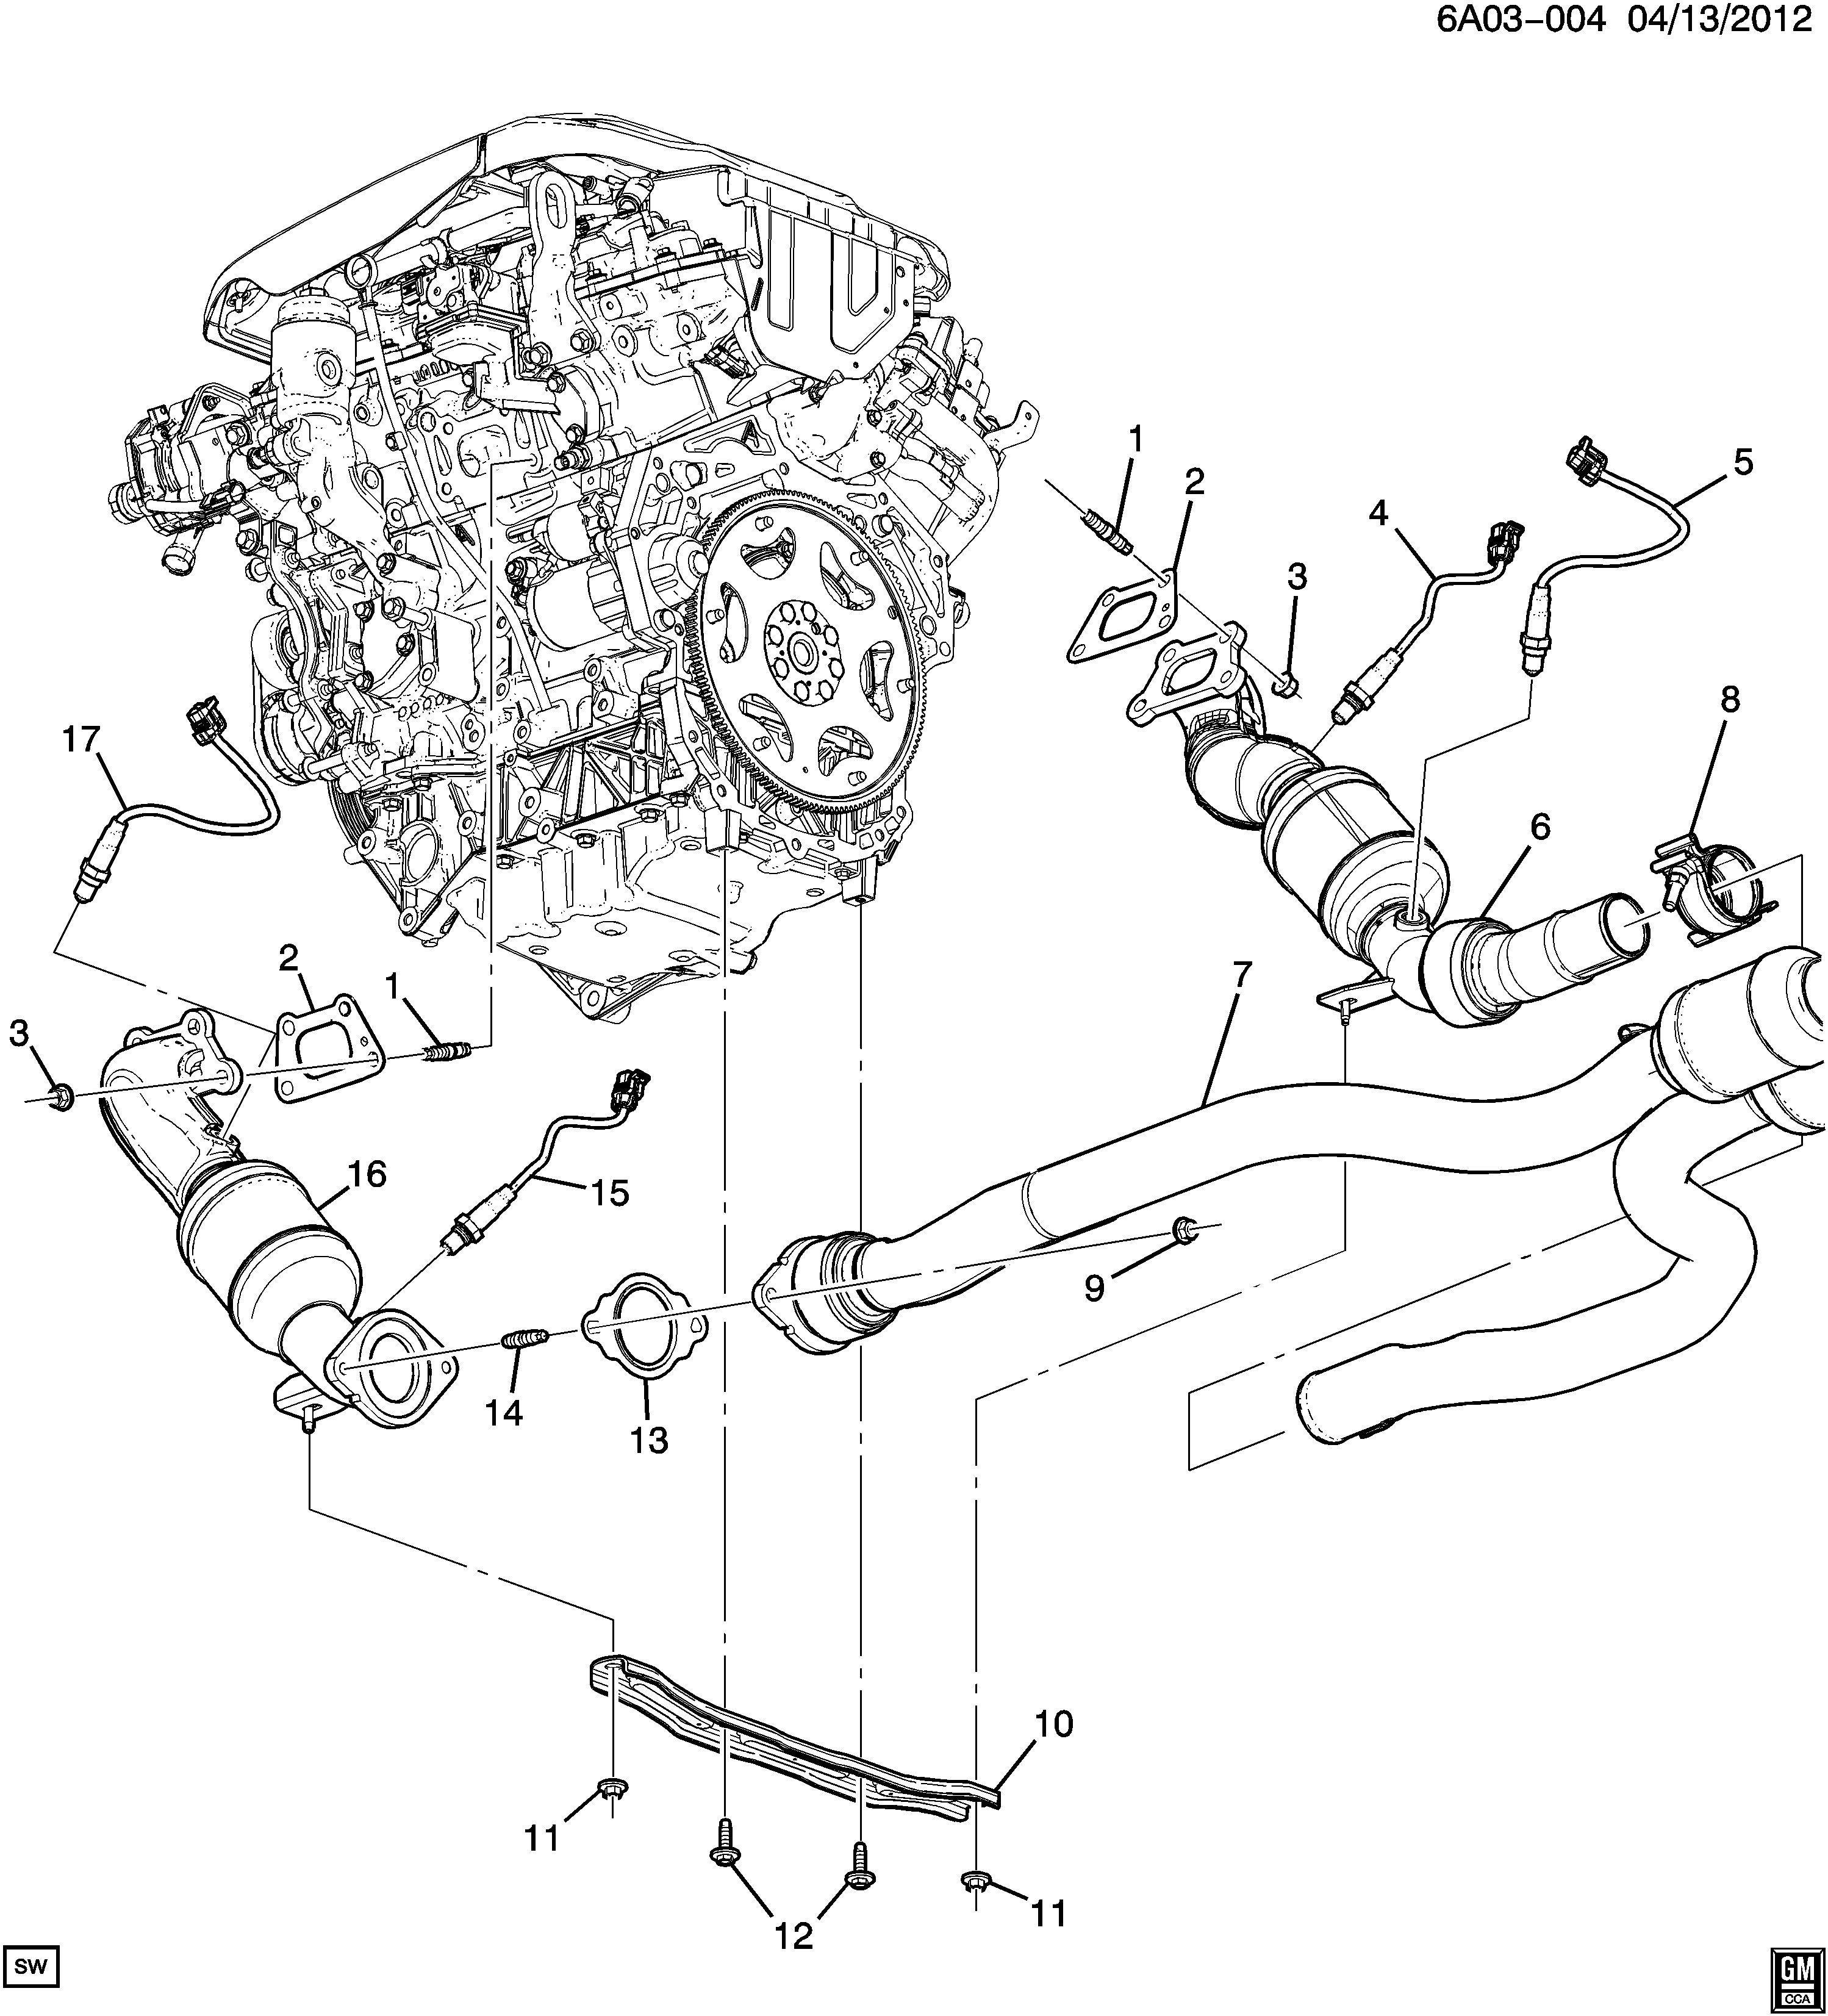 Cadillac Ats Performance Sensor Computer Control